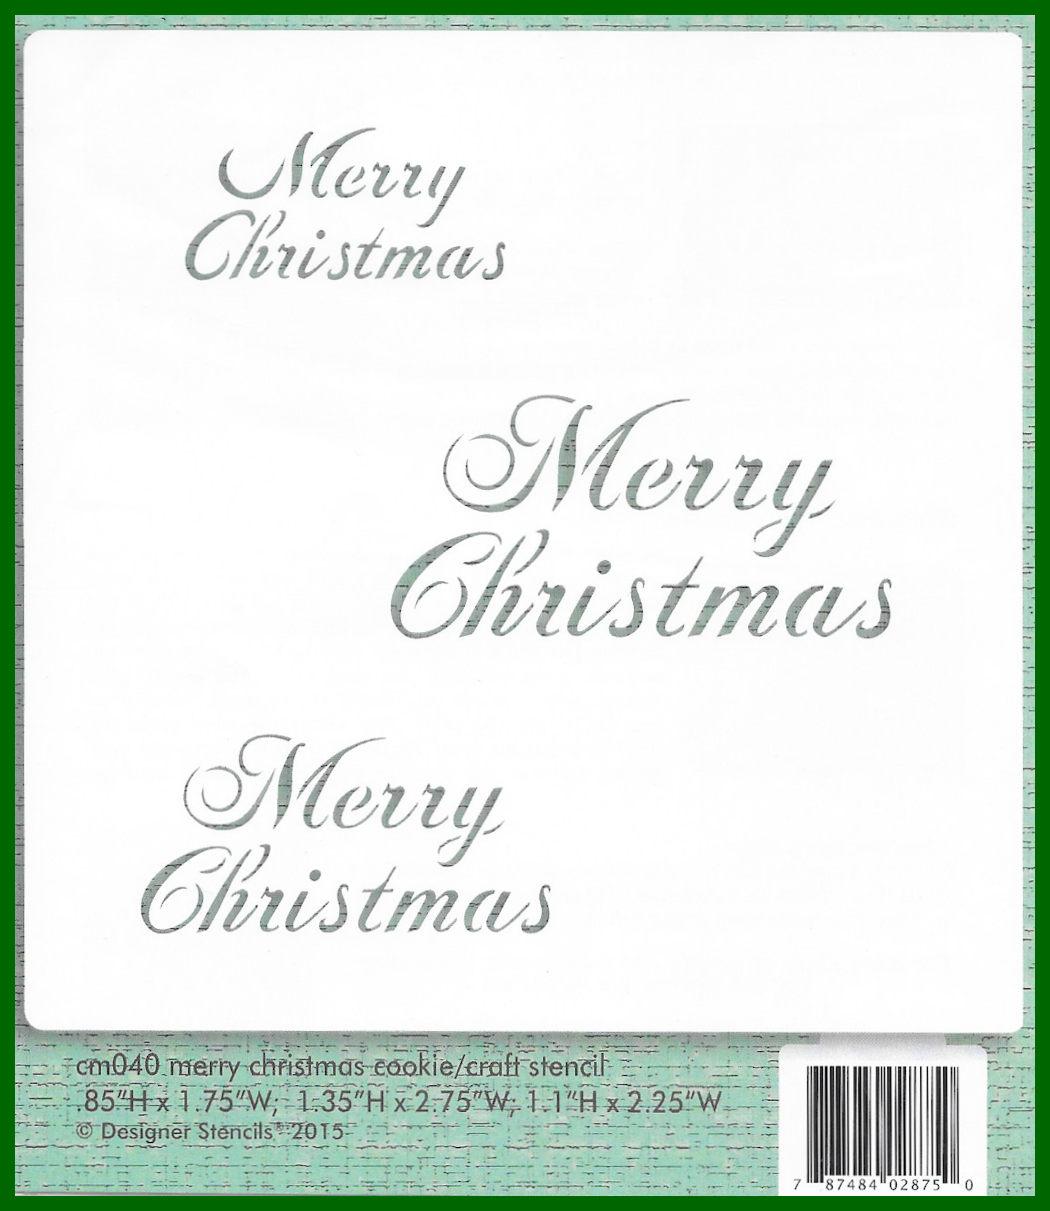 da-merry-christmas-8748402875.jpg